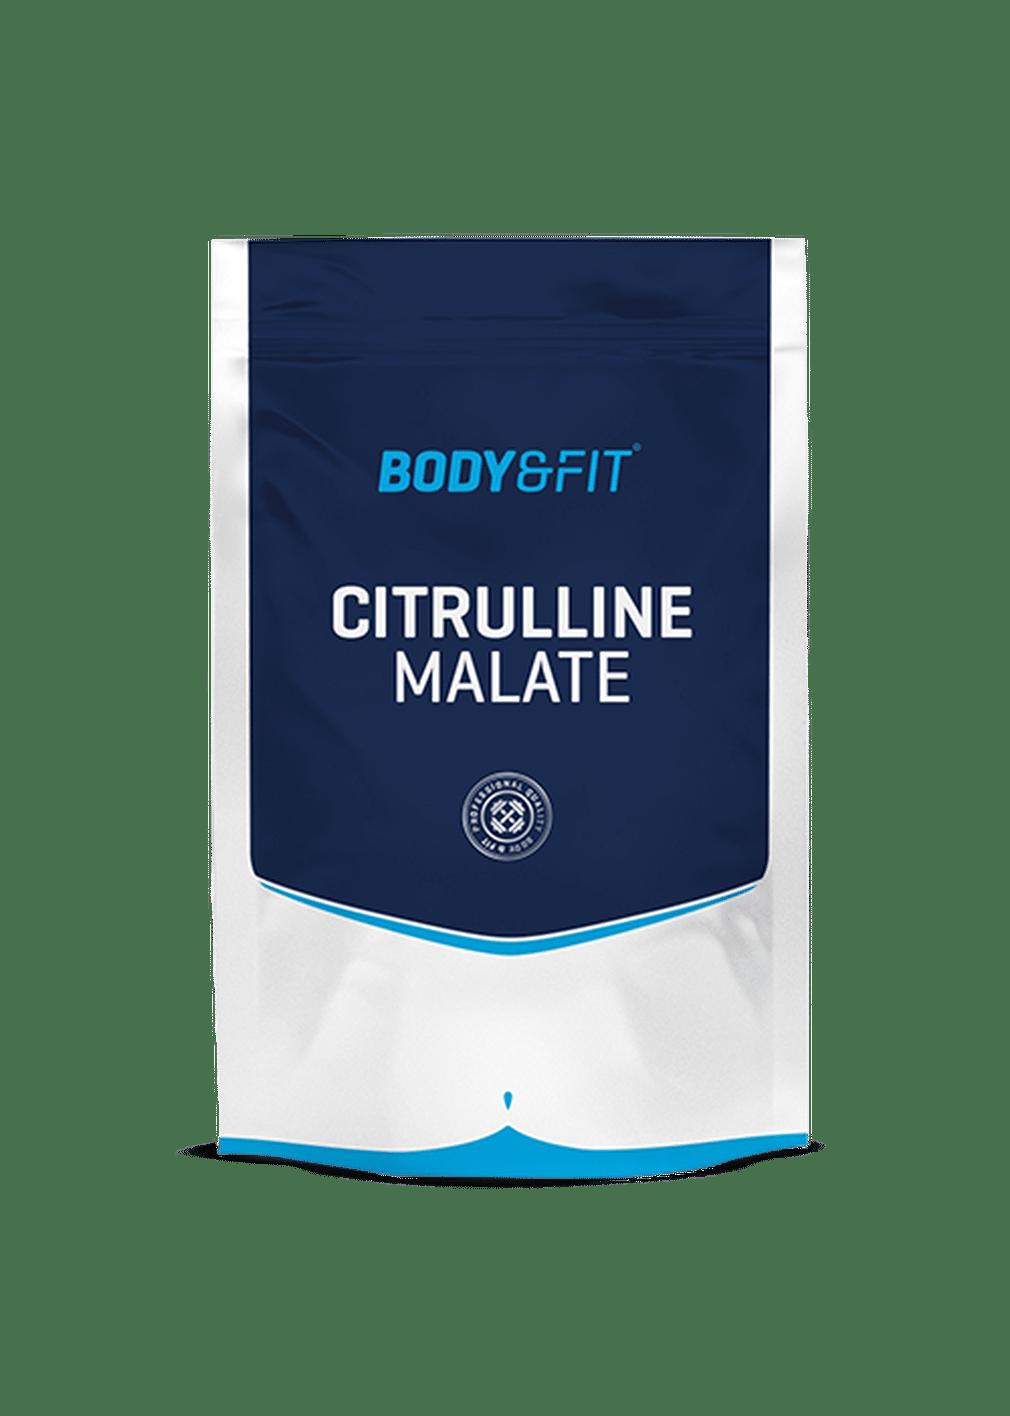 BF citrulline